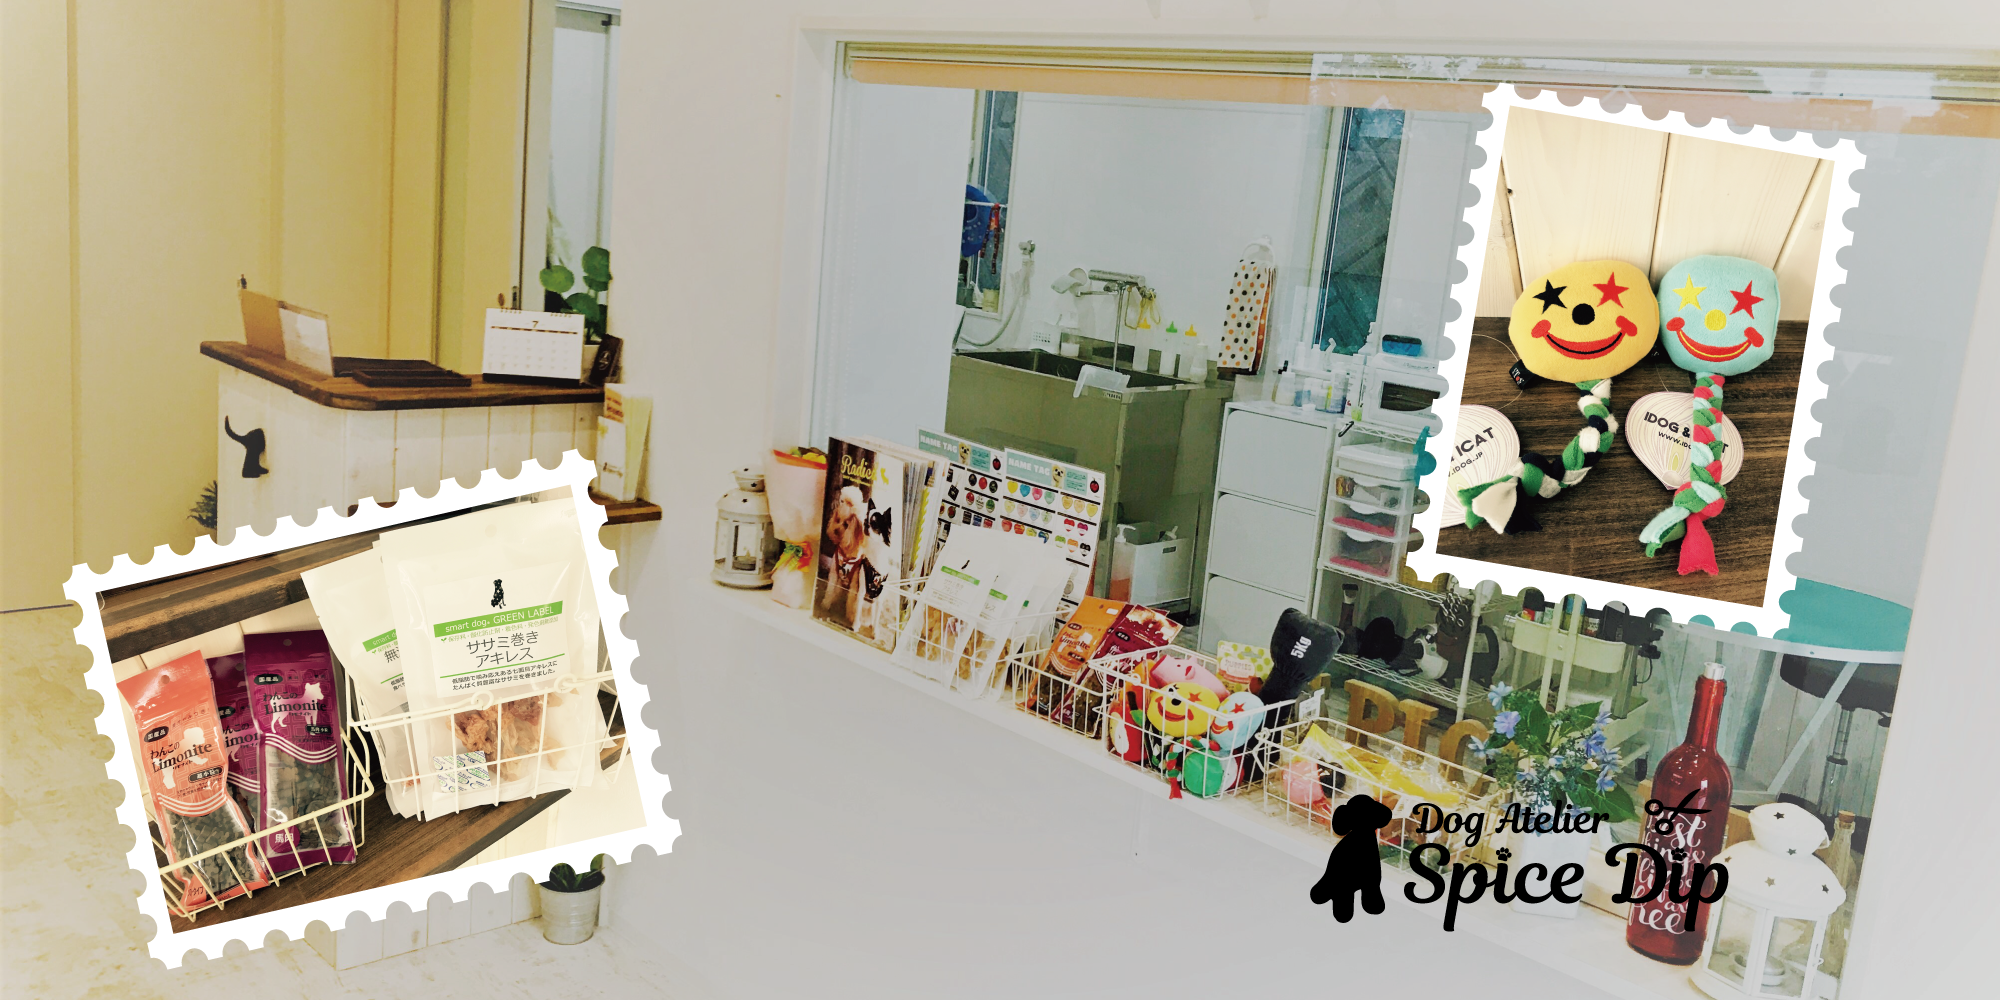 Dog Atelier Spice Dip